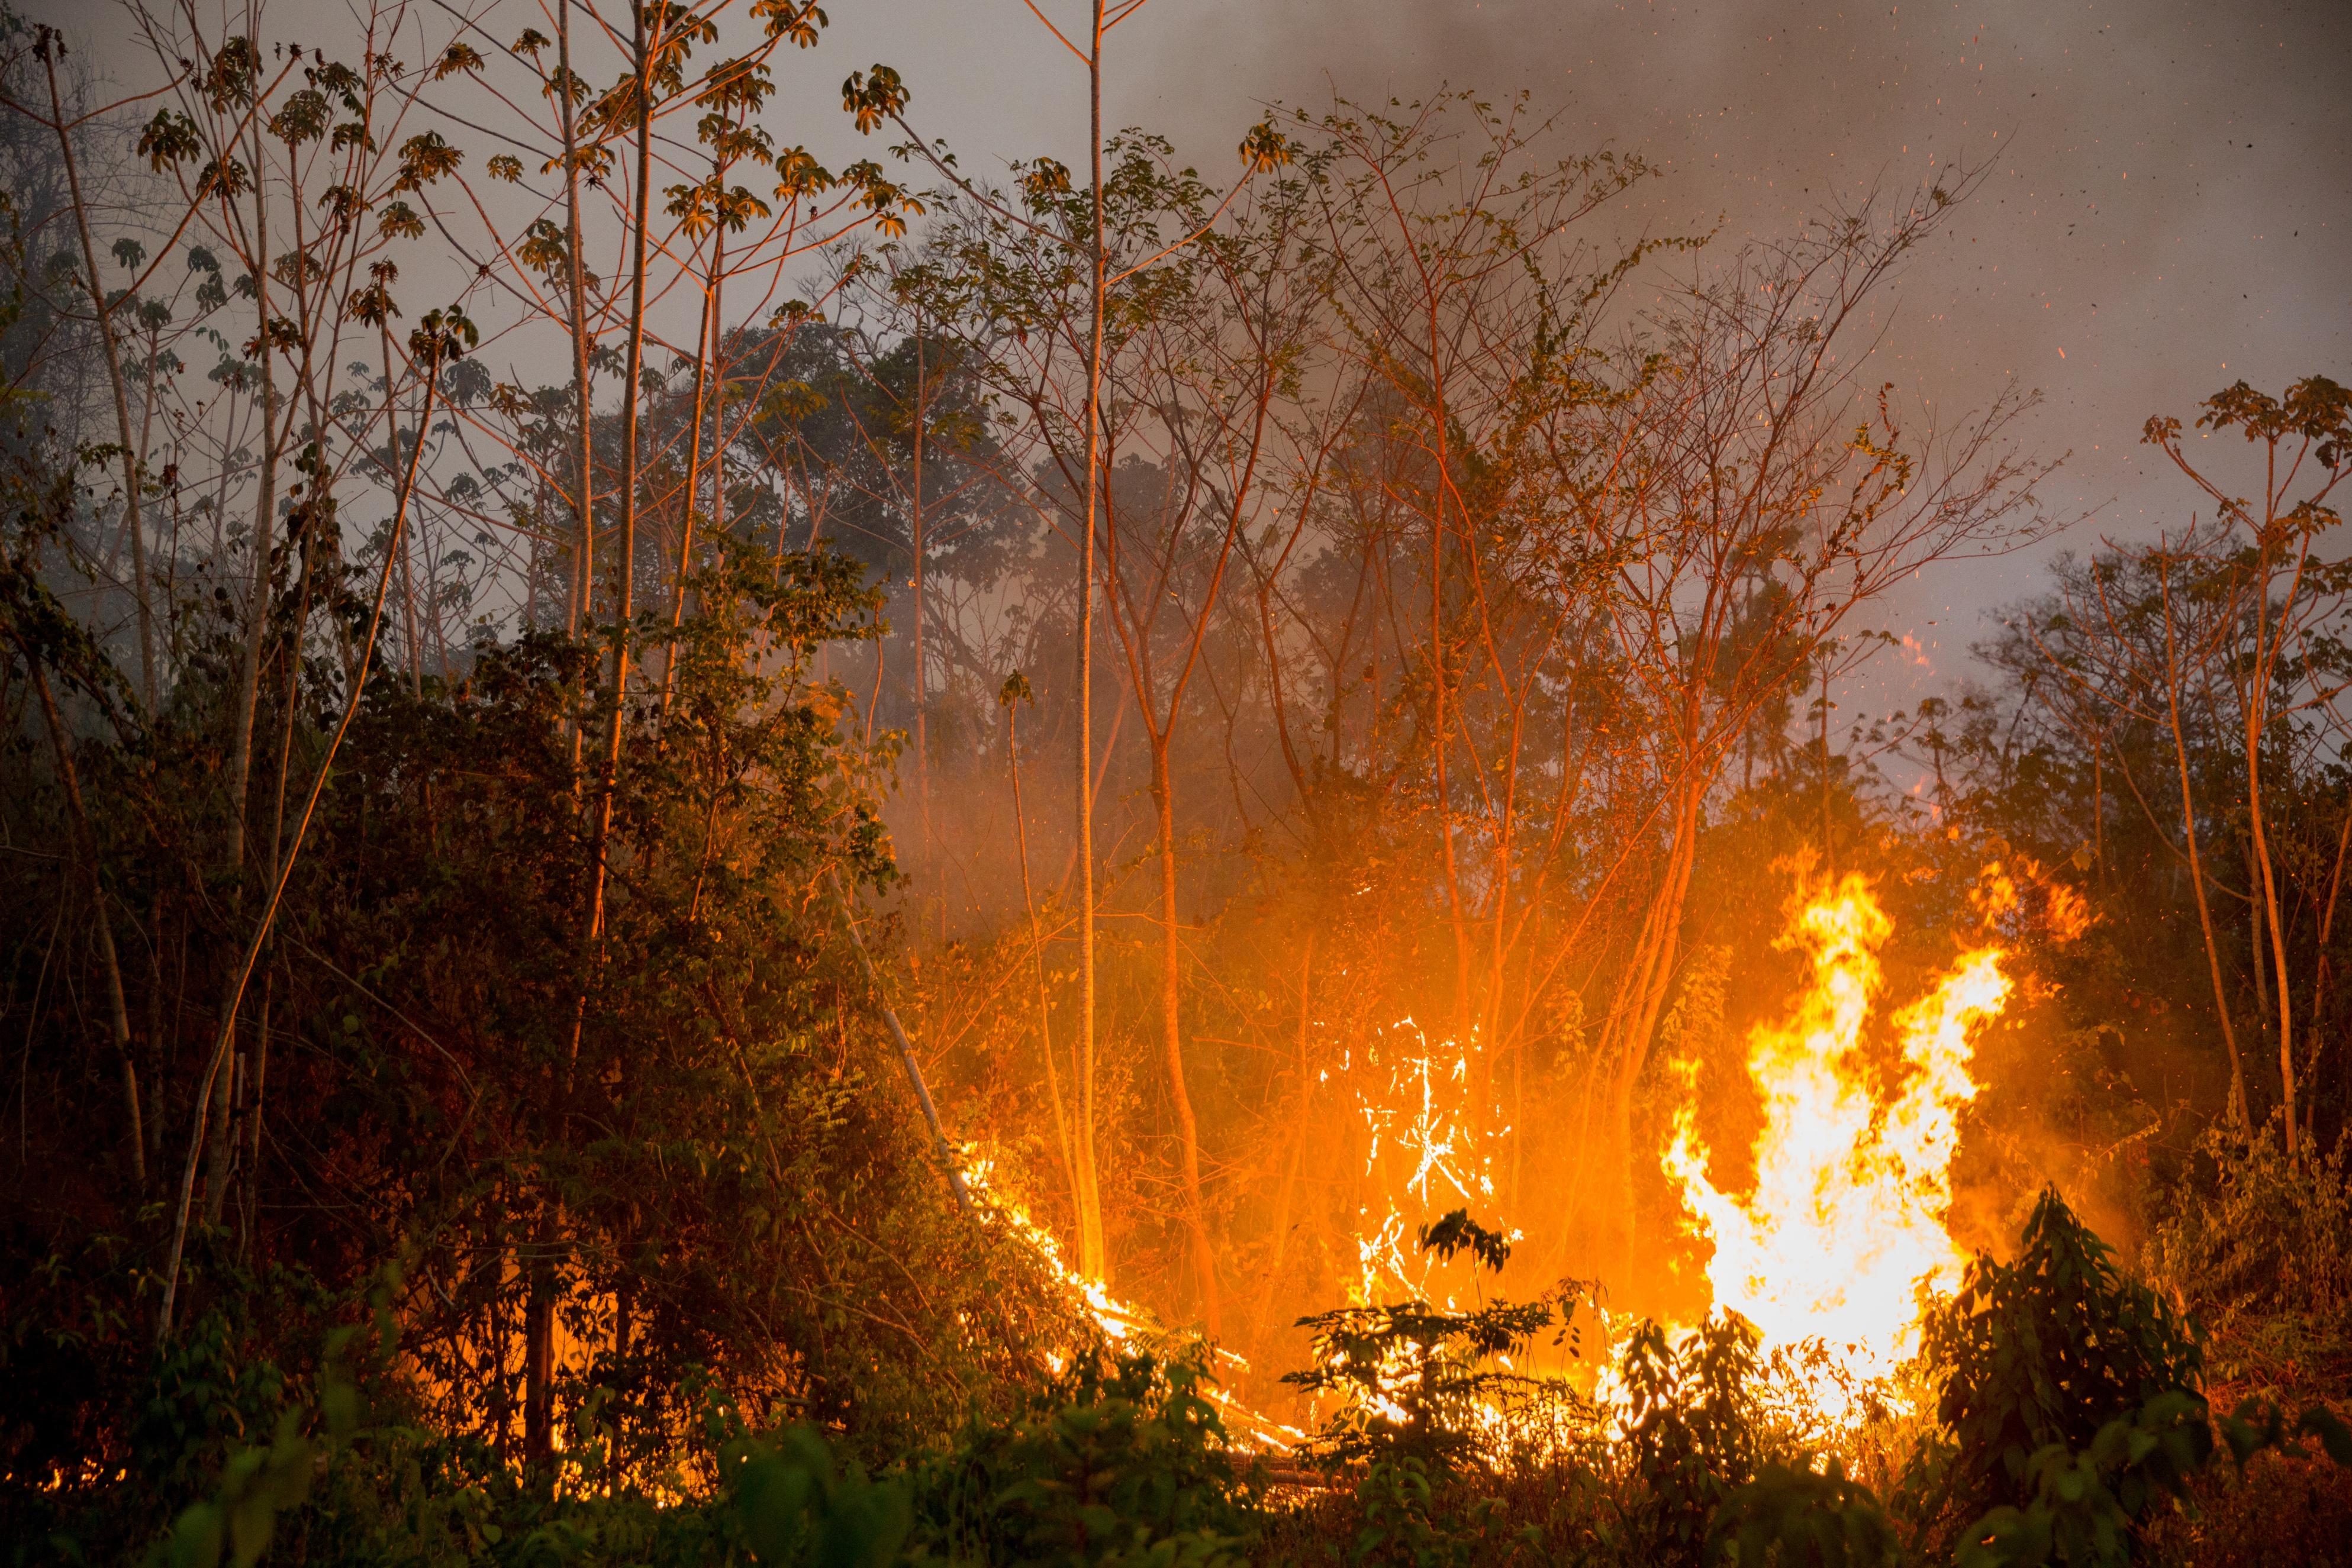 (Foto: Marizilda Cruppe / Greenpeace)